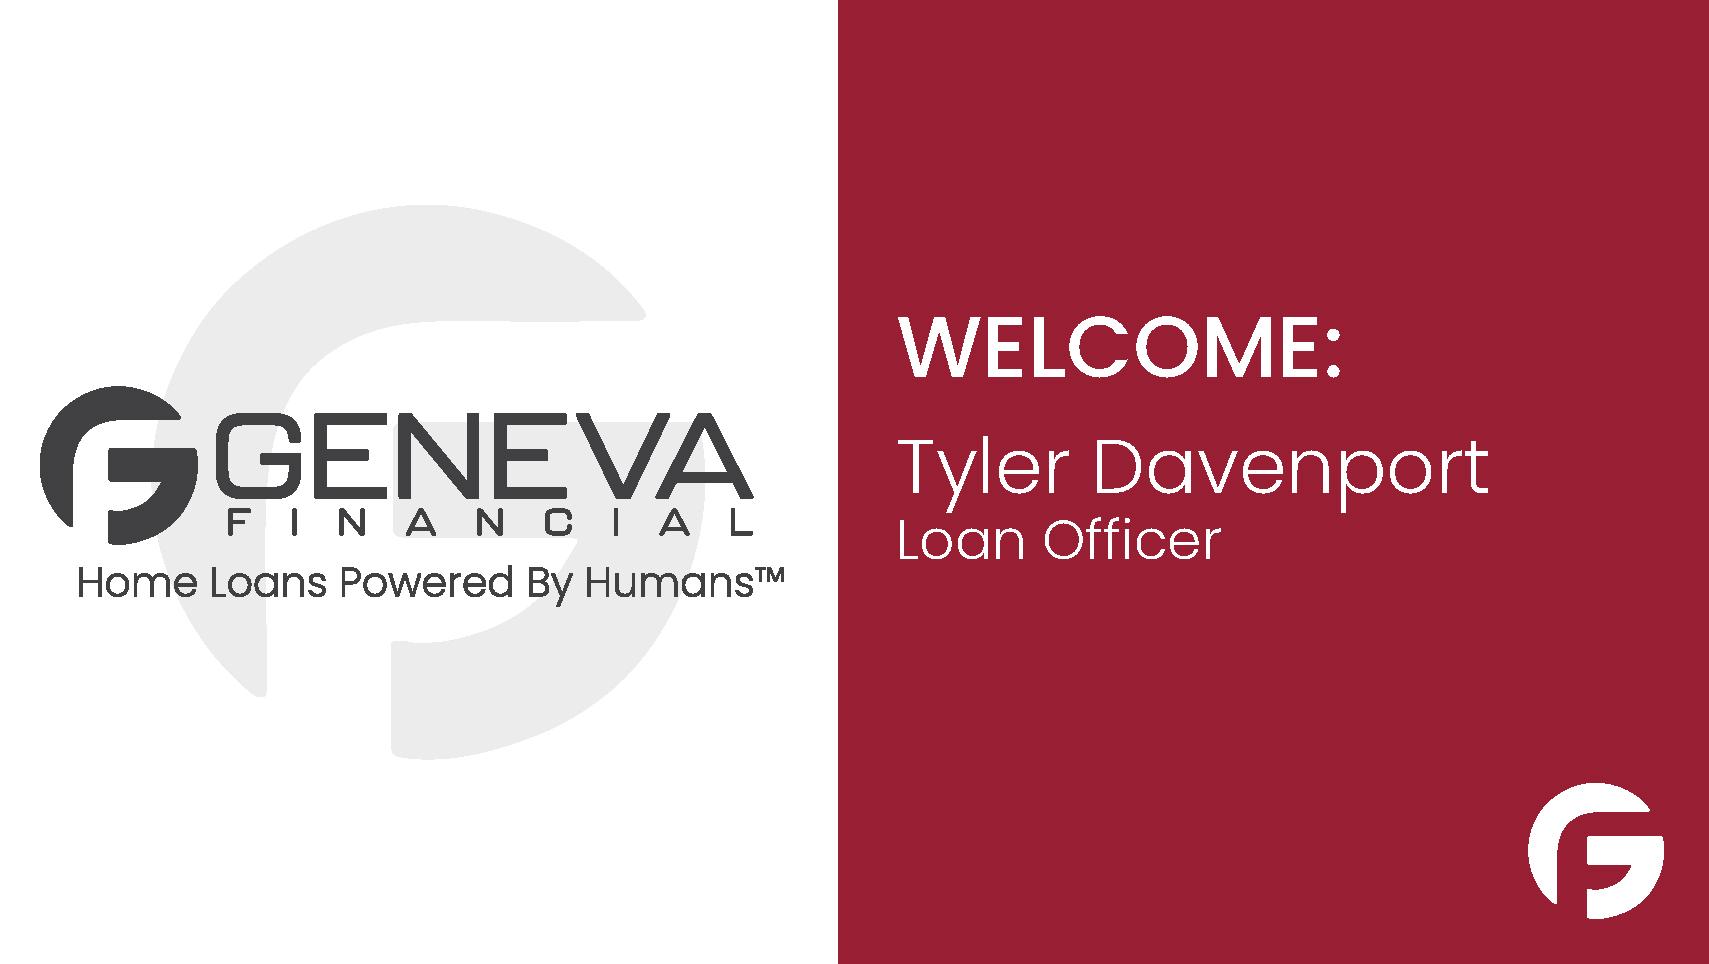 Tyler Davenport, Loan Originator, serving Arizona